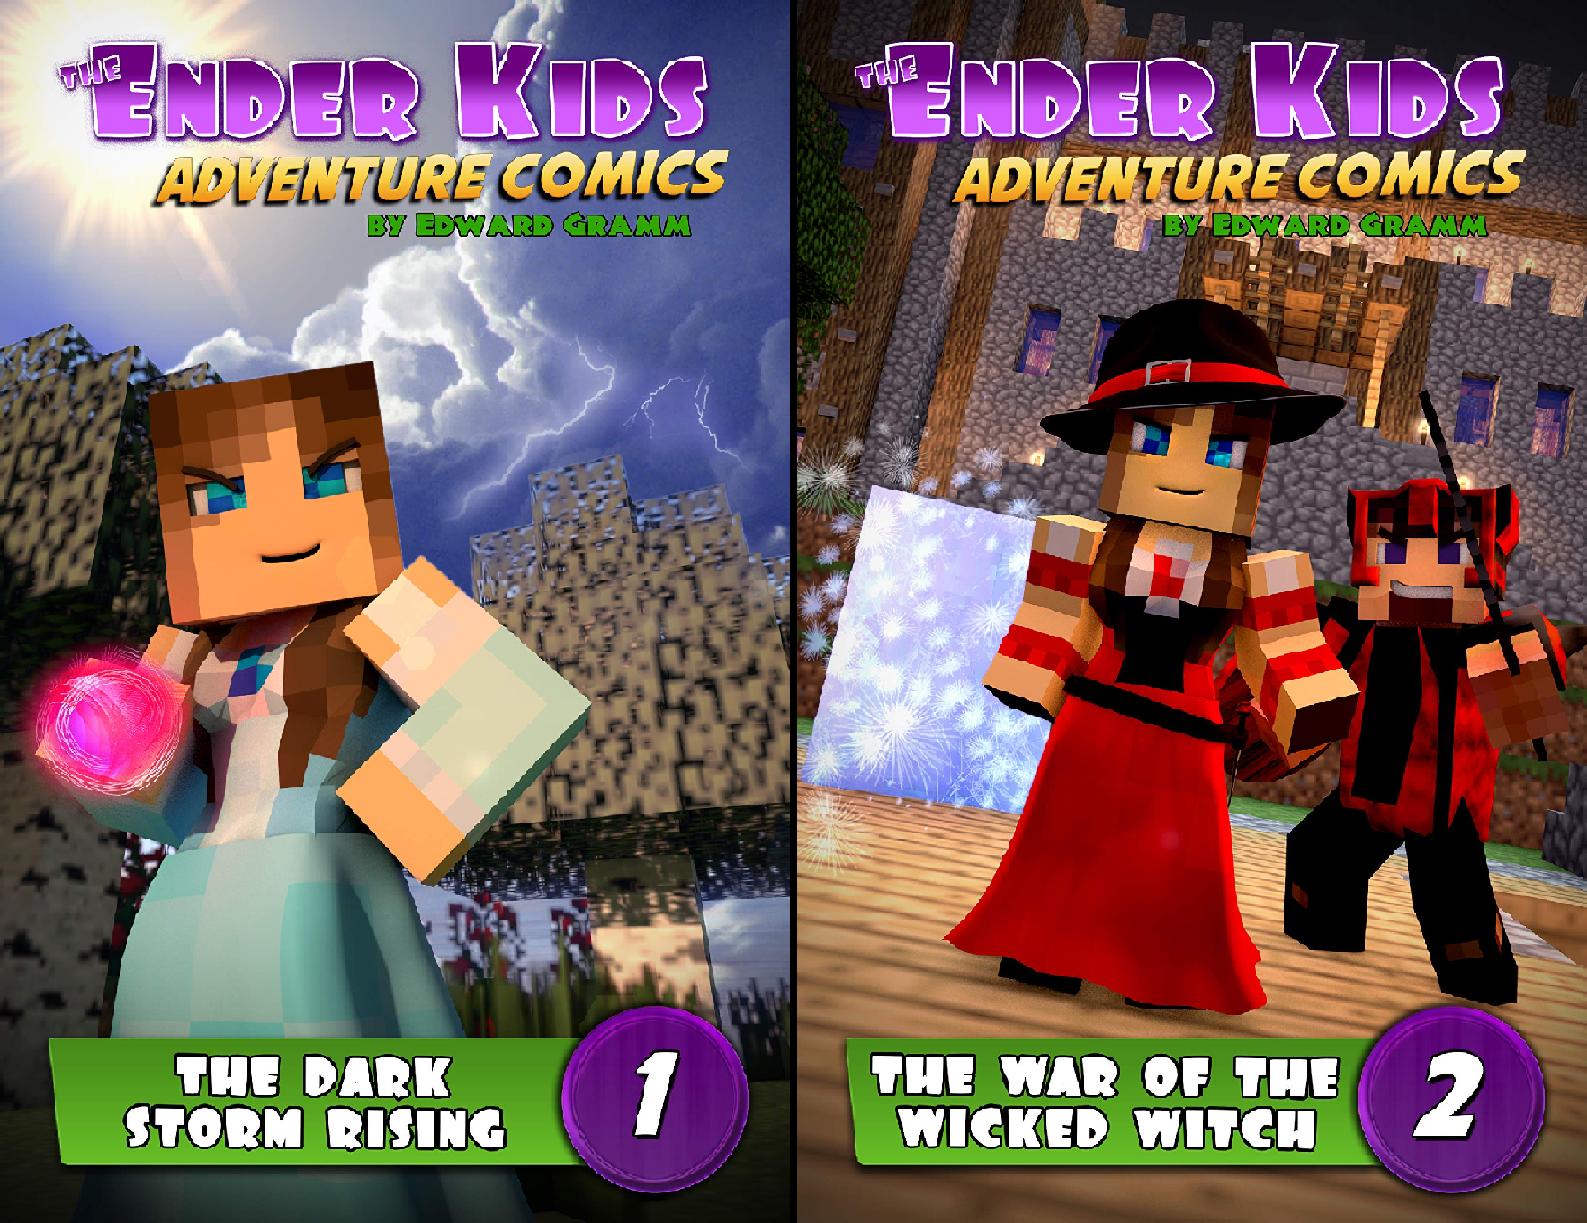 The Ender Kids Adventure Comics (2 Book Series)